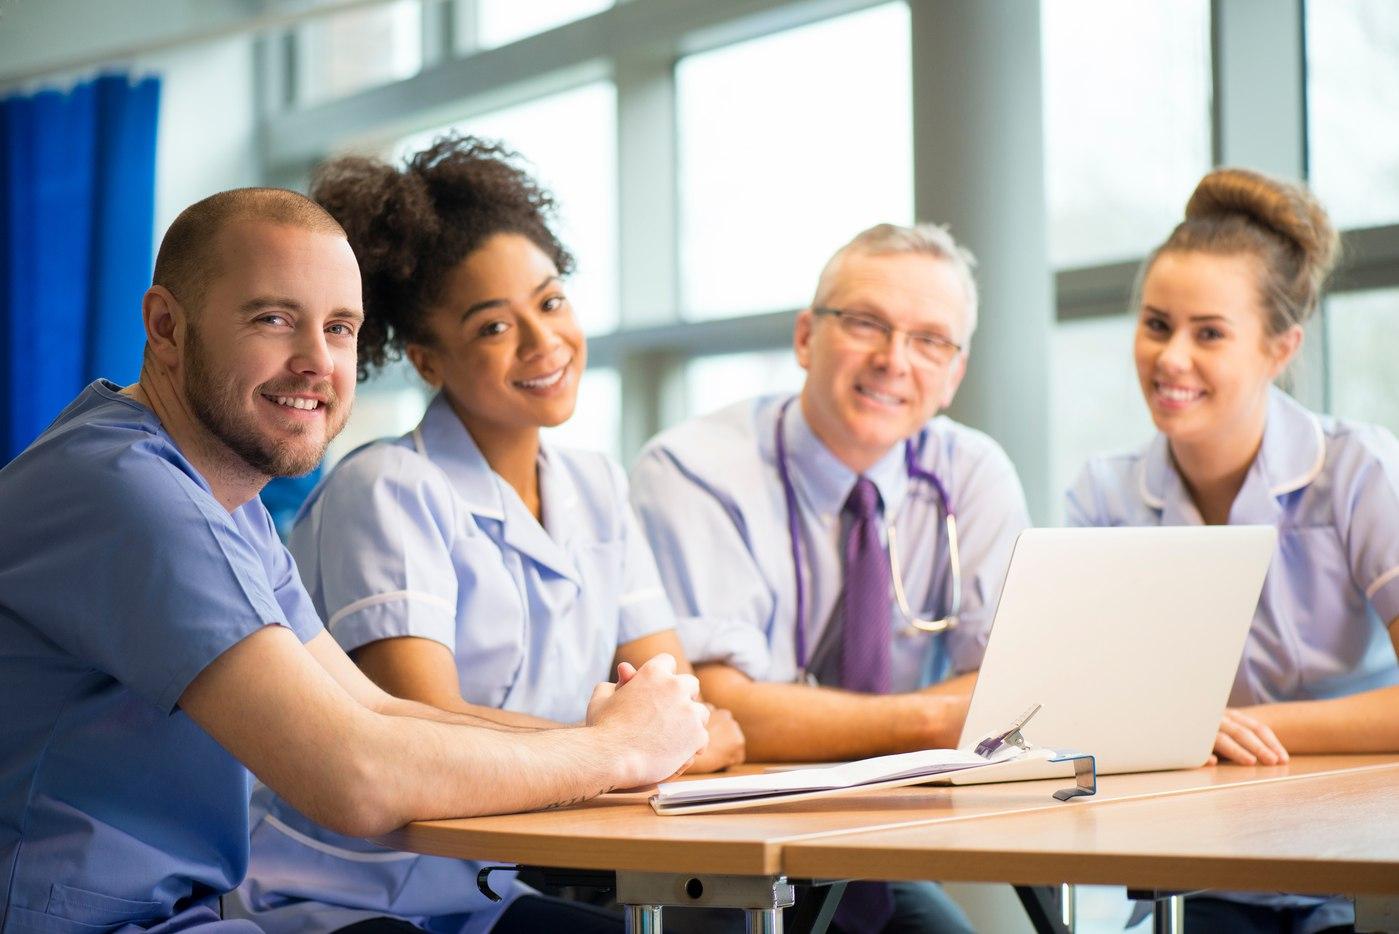 medical-staff-meeting-000038976992_XXXLarge-1